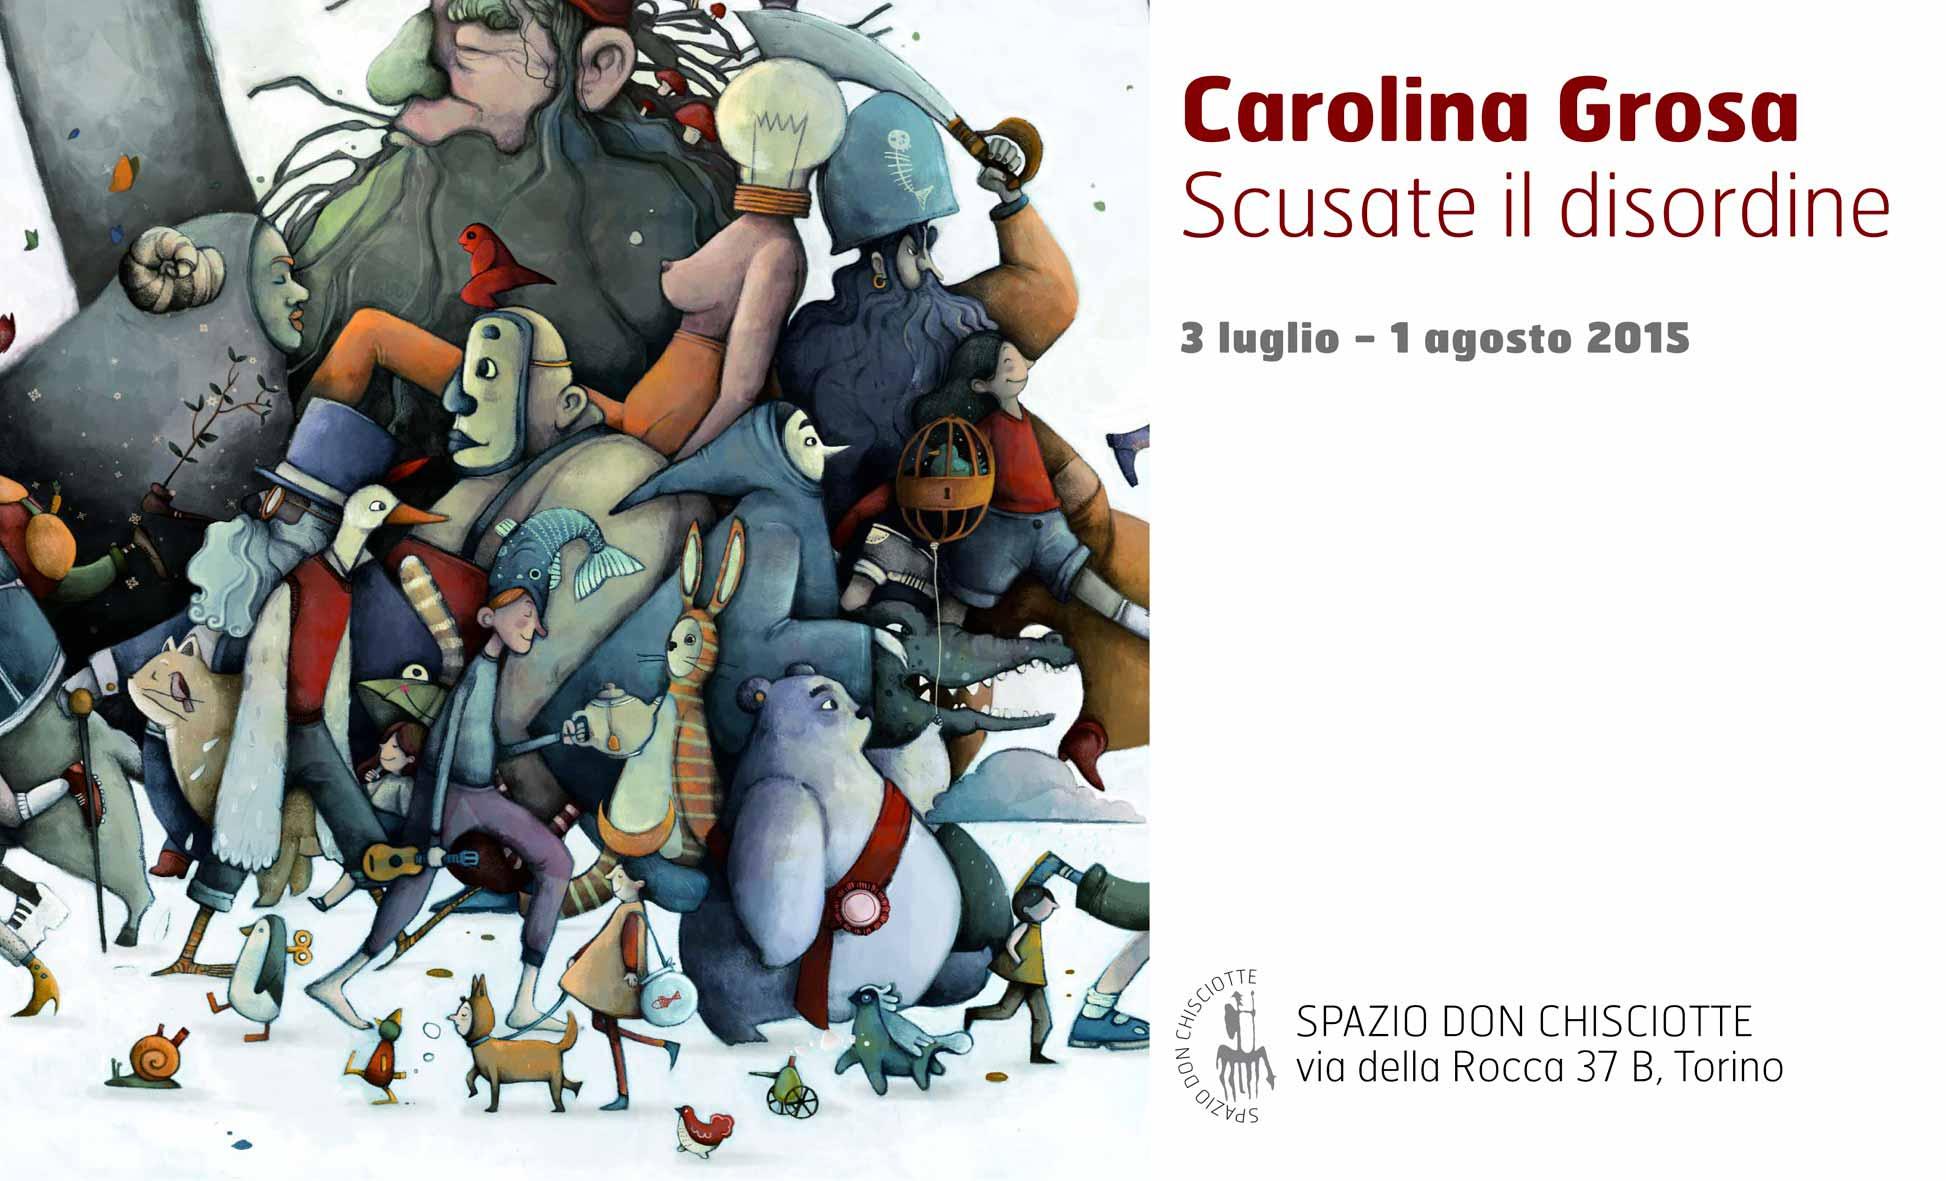 Carolina Grosa Scusate il disturbo